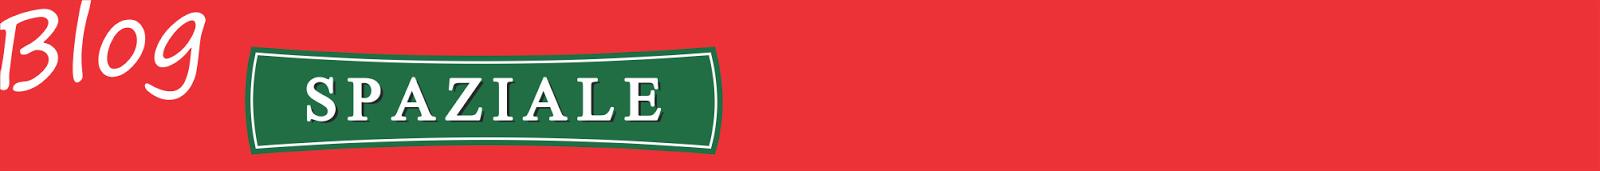 Spaziale Italiana